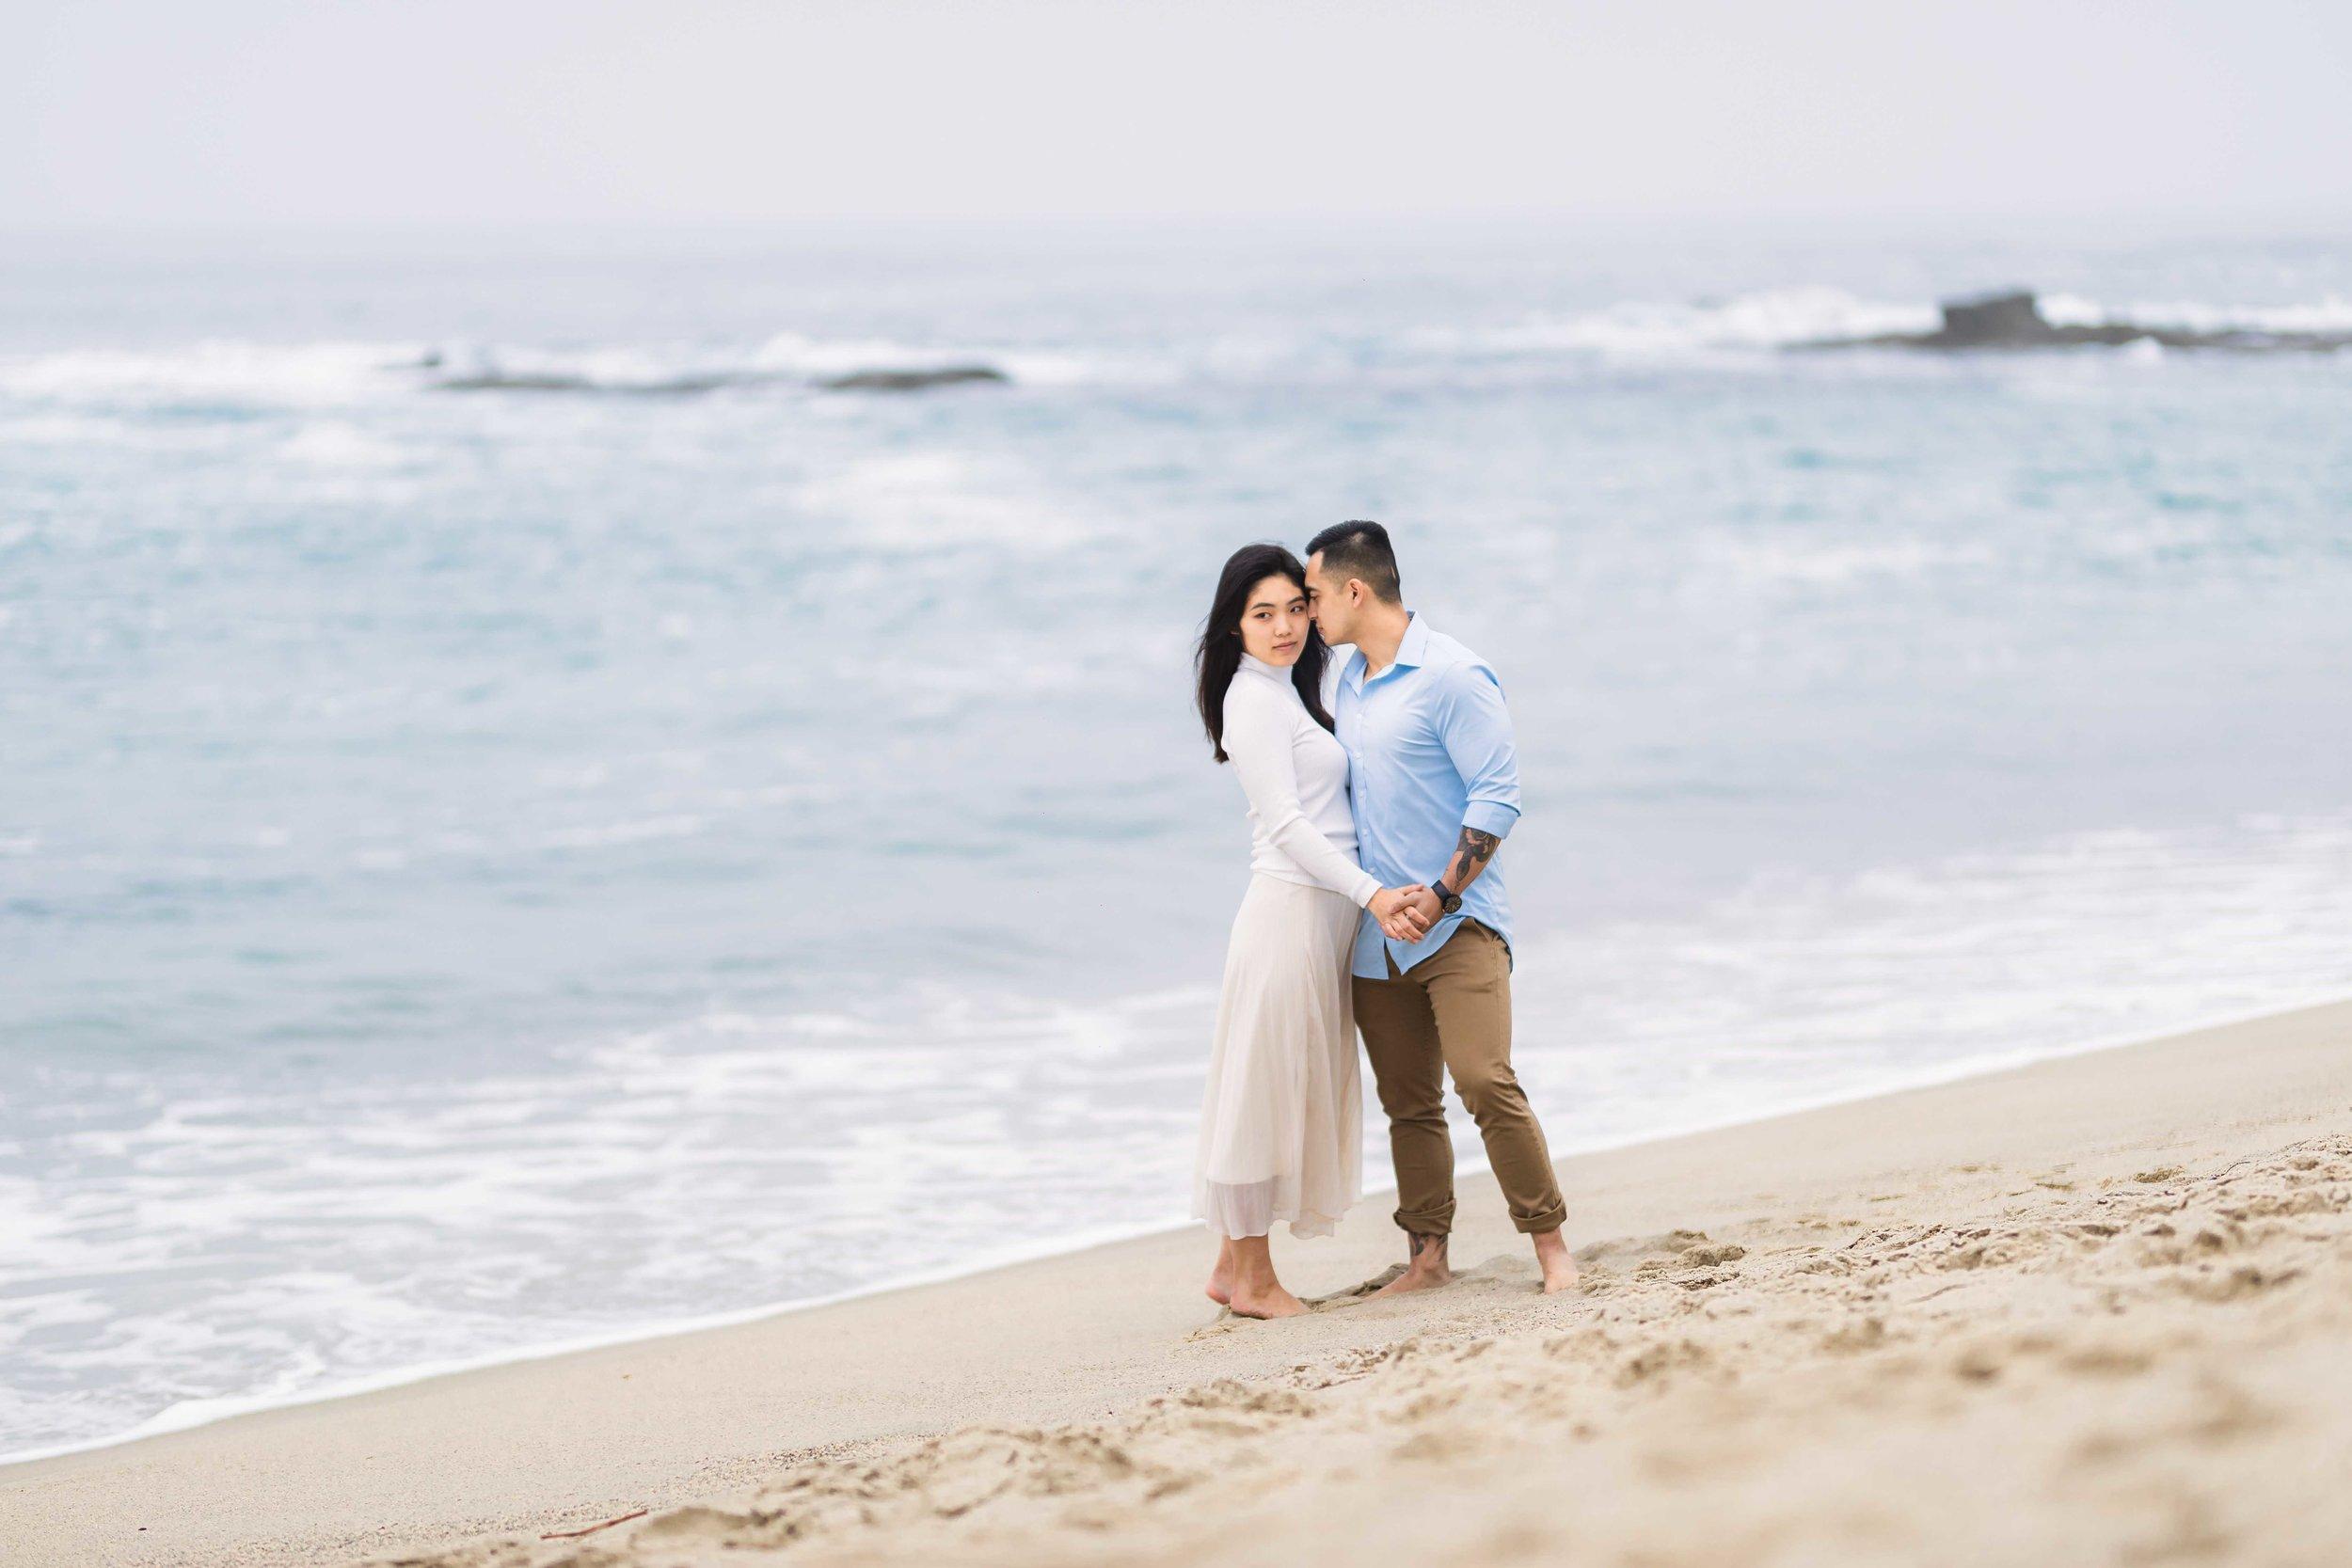 orange_county_beach_engagement_joshuachun_photography_-3.JPG